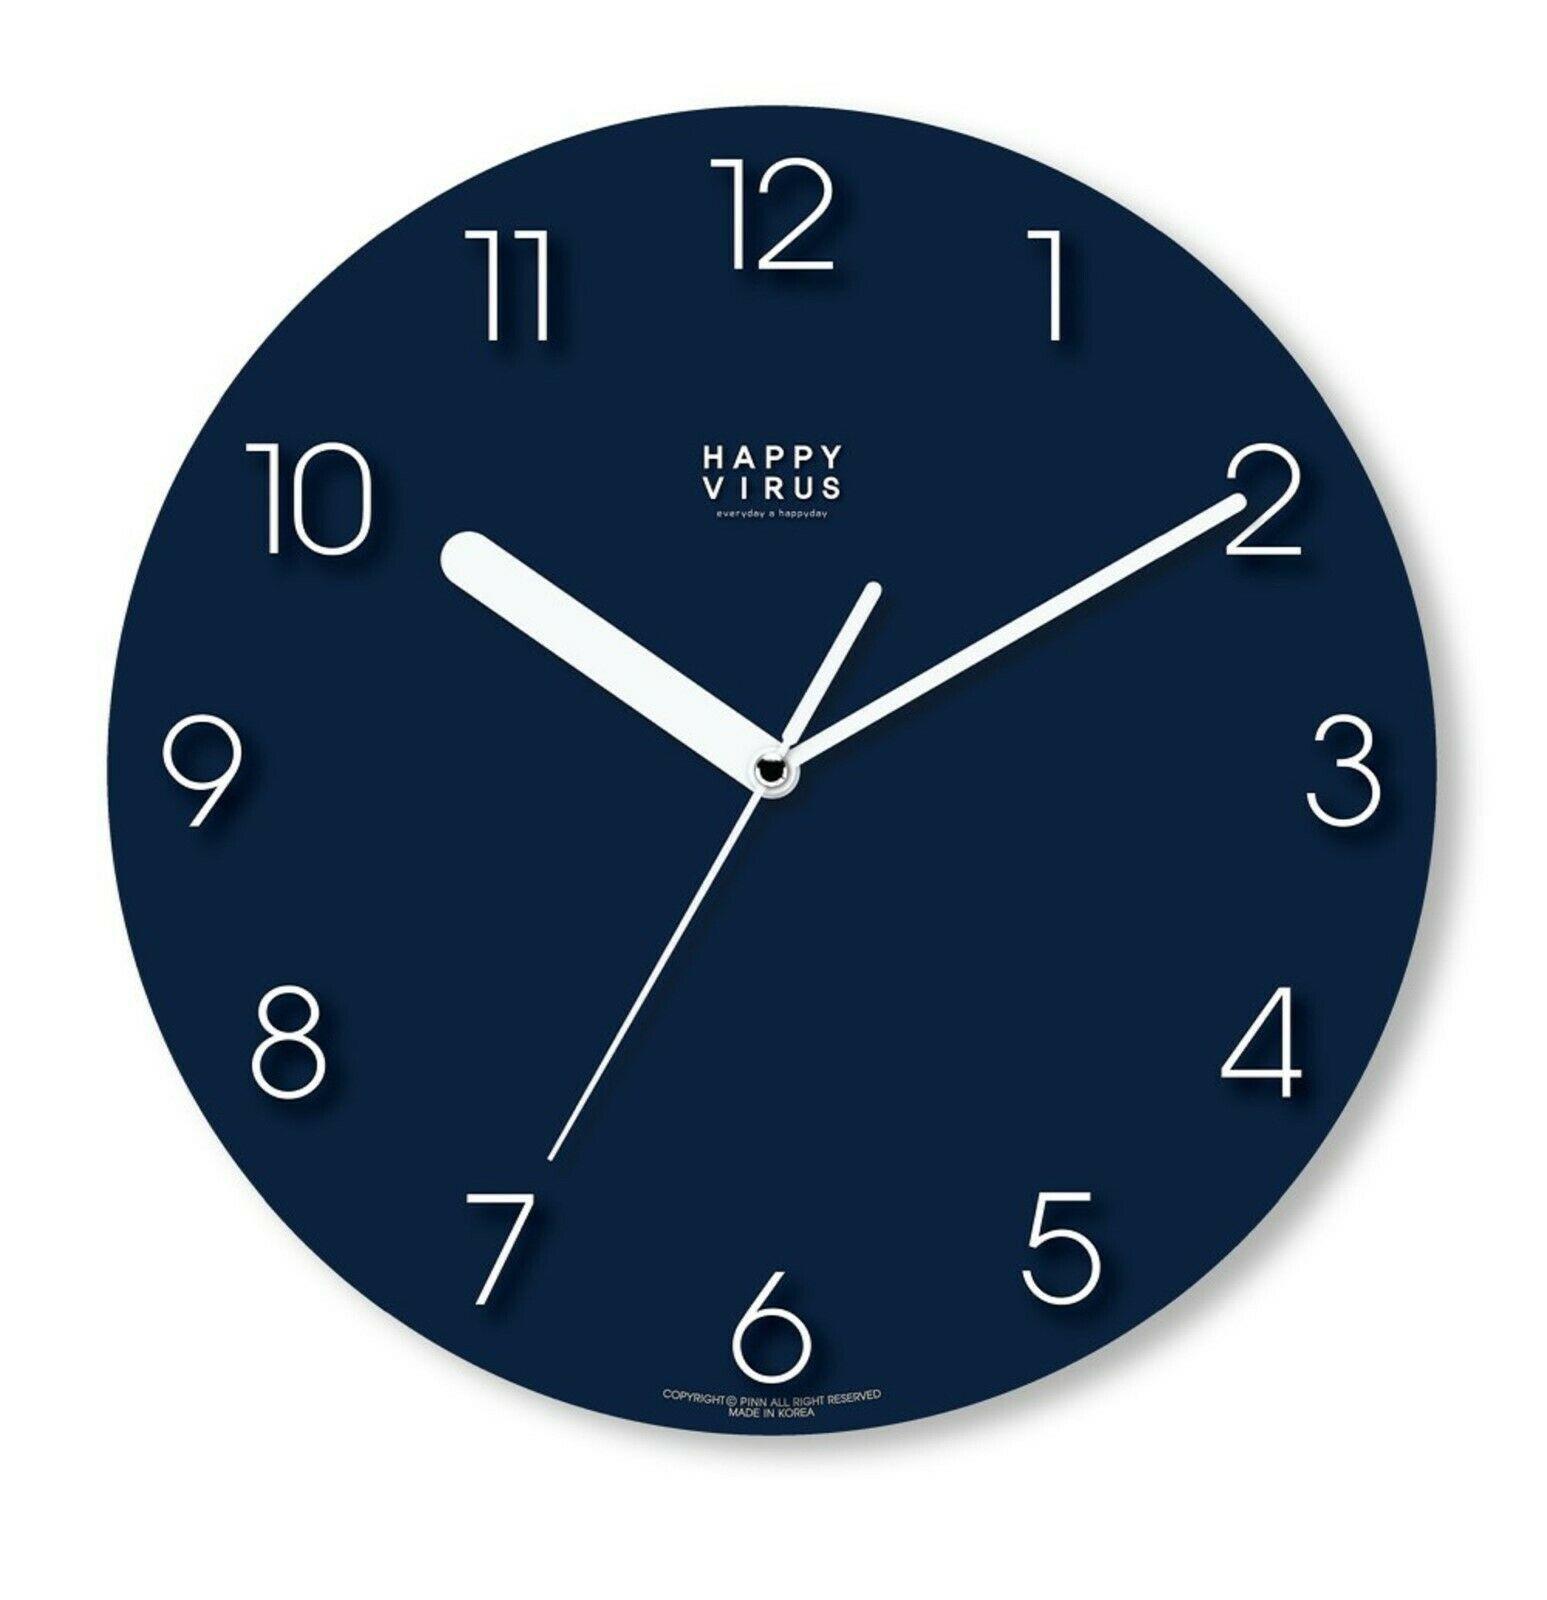 Happy Virus 5019 Wall Clock Navy White MDF Non-Ticking Silent Modern Round Type